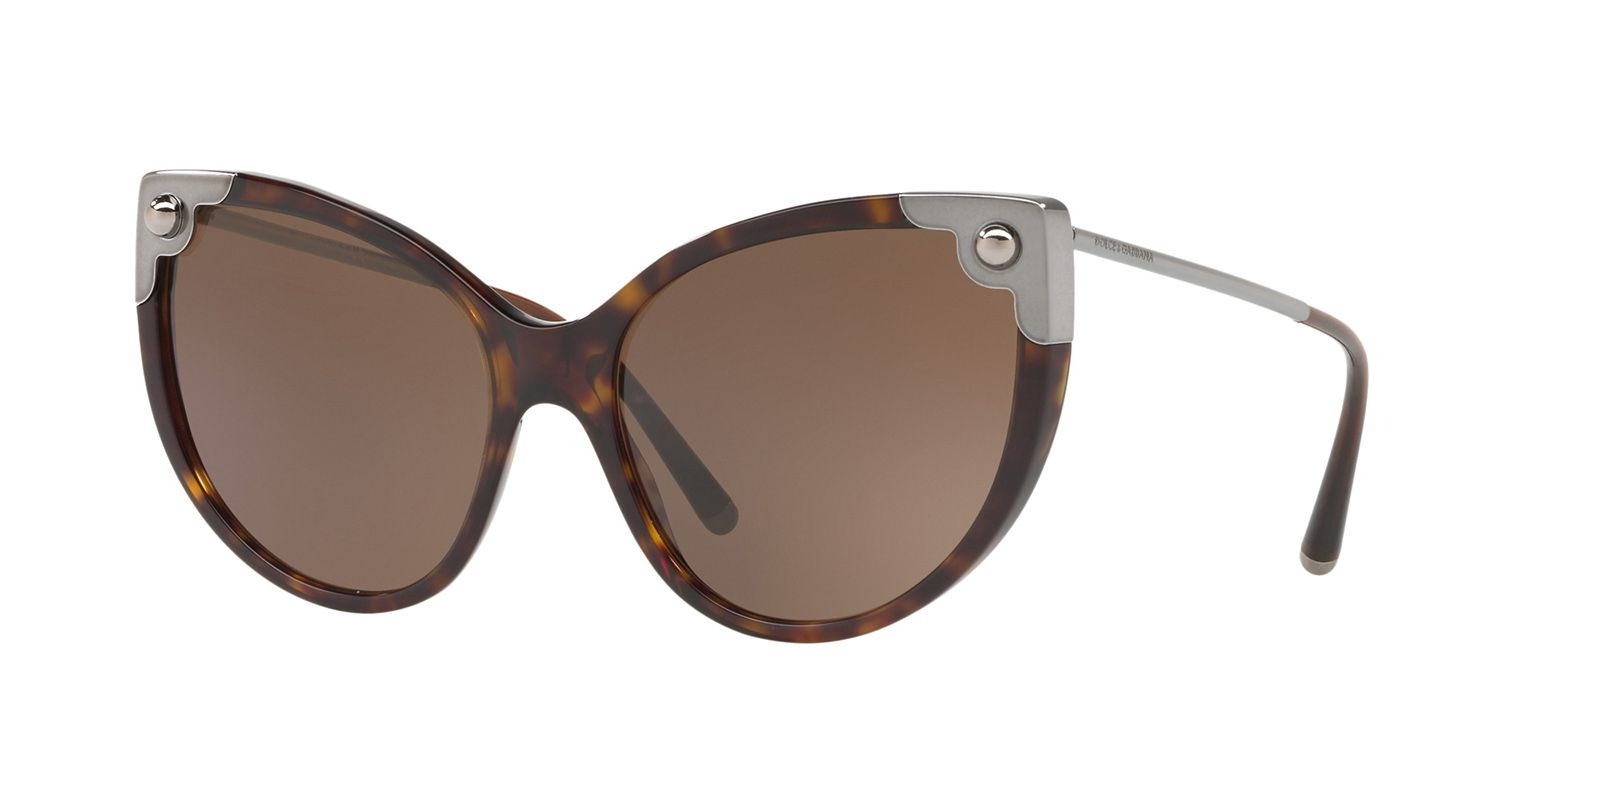 DG 4337 Cats Eye Sunglasses